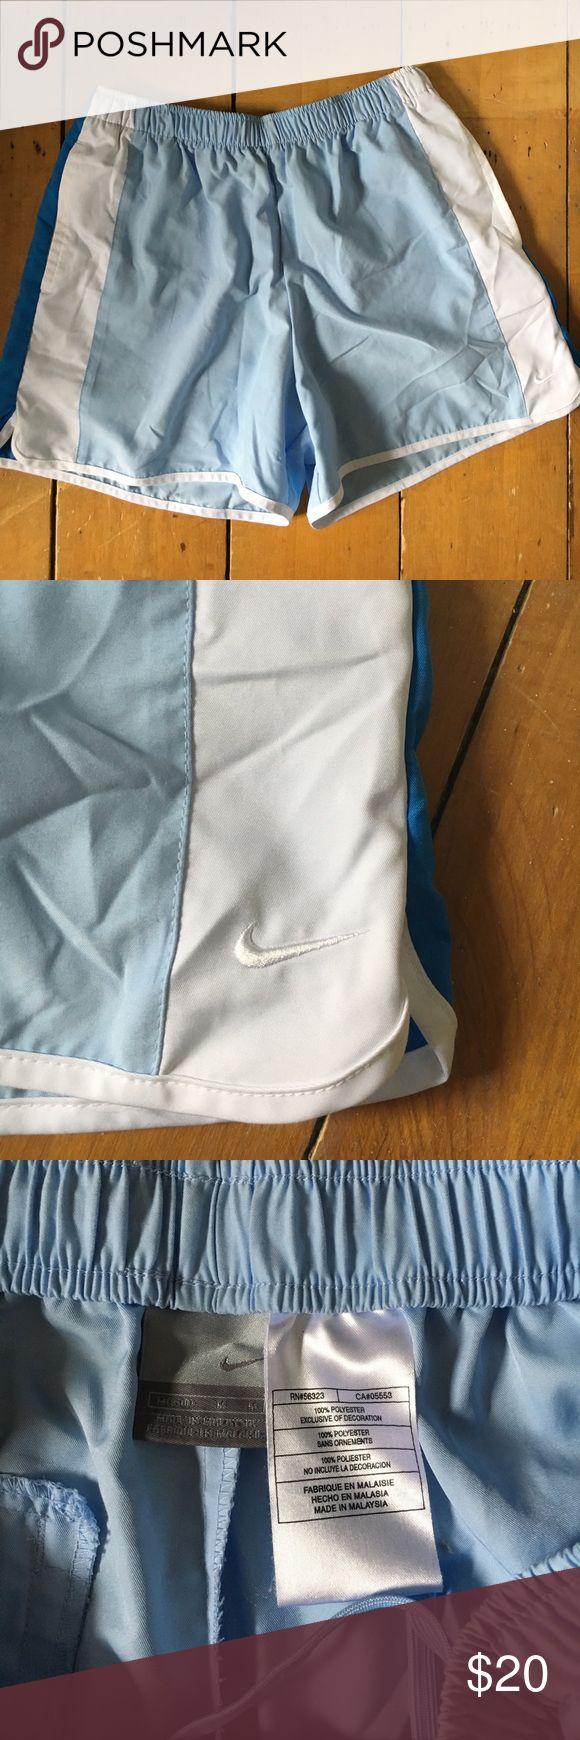 Nike // Soccer Shorts NWOT Nike Shorts